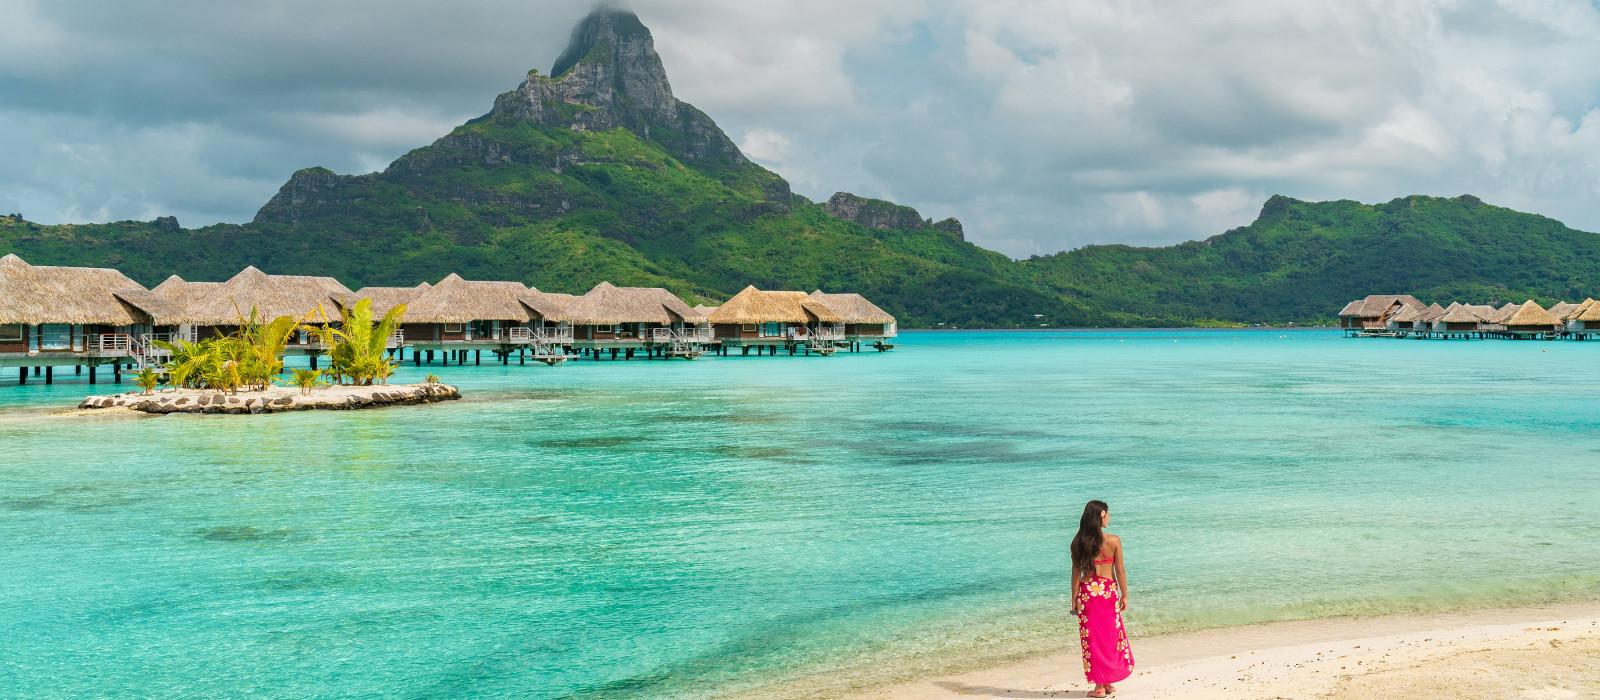 French Polynesia Vacation - Bora Bora